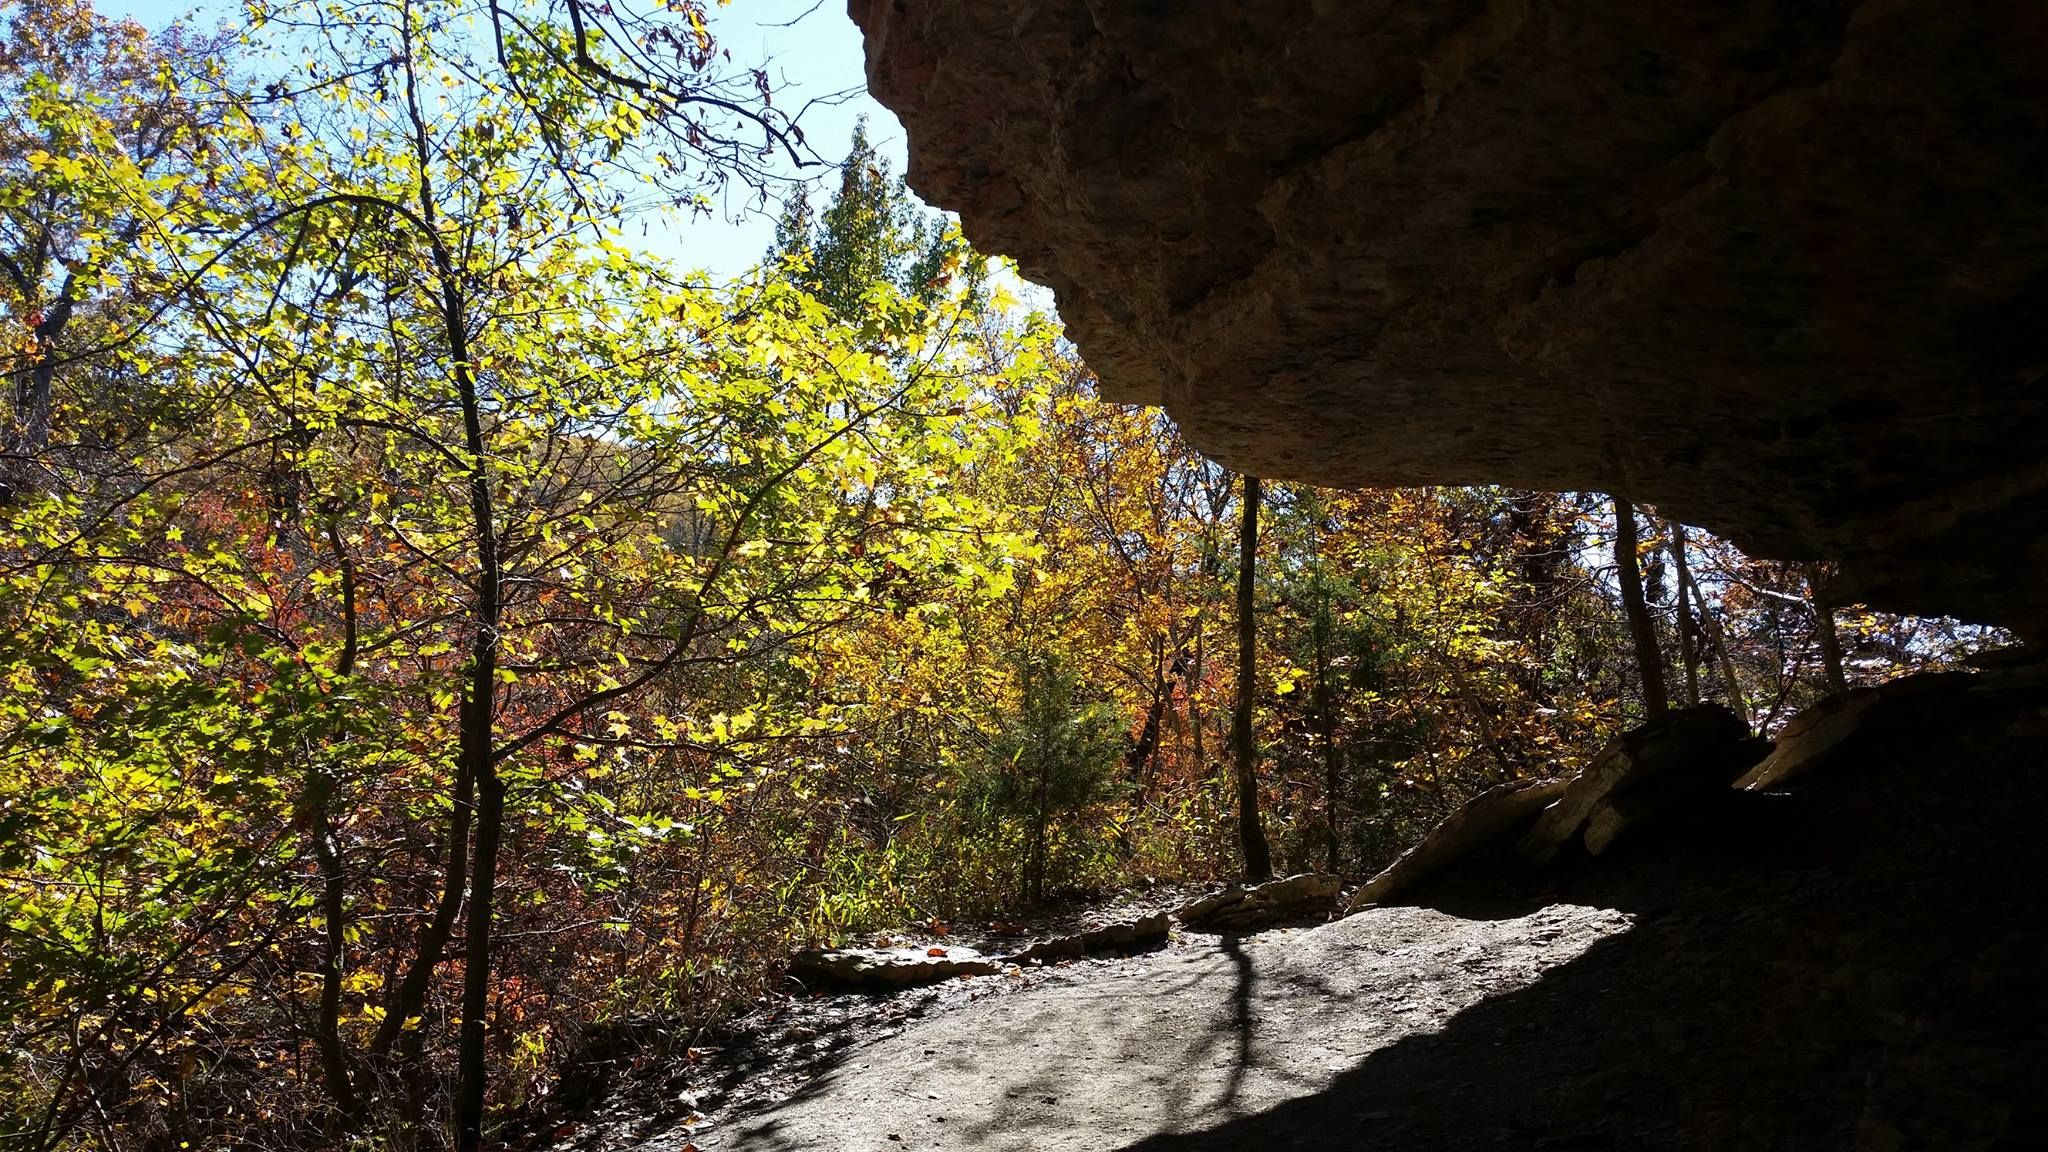 NW Arkansas Ozark mountains, Ozarks, Backwoods